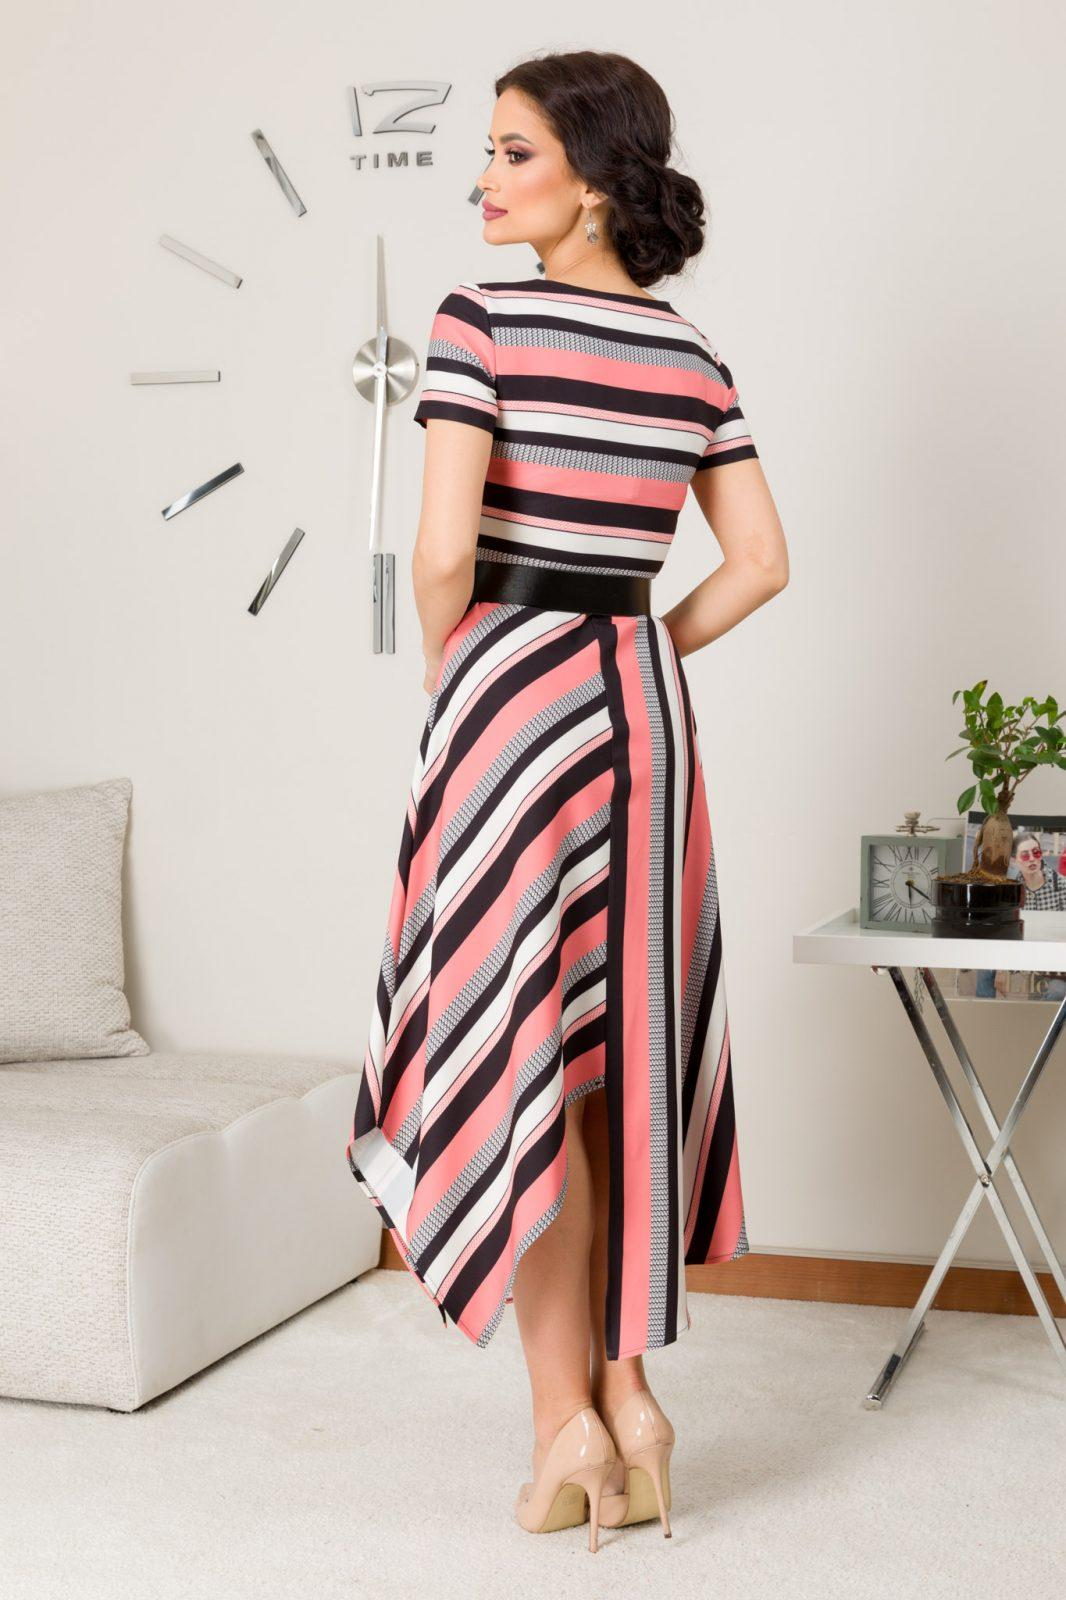 Paige Ροζ Ριγέ Φόρεμα  7302